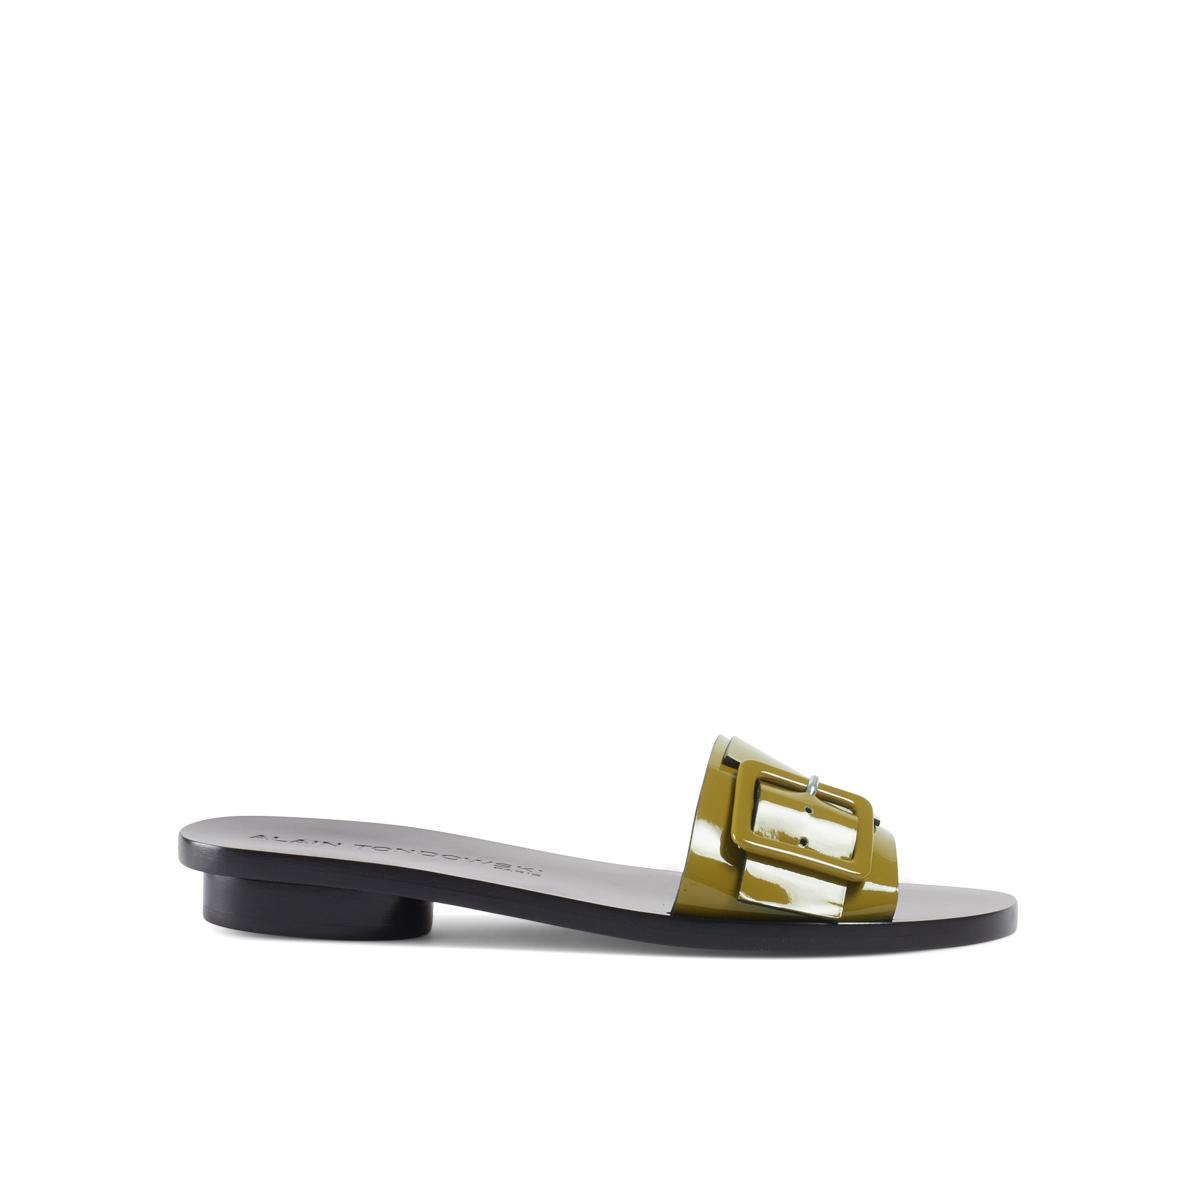 037_alaintondowski_springsummer2017_shoes_3015